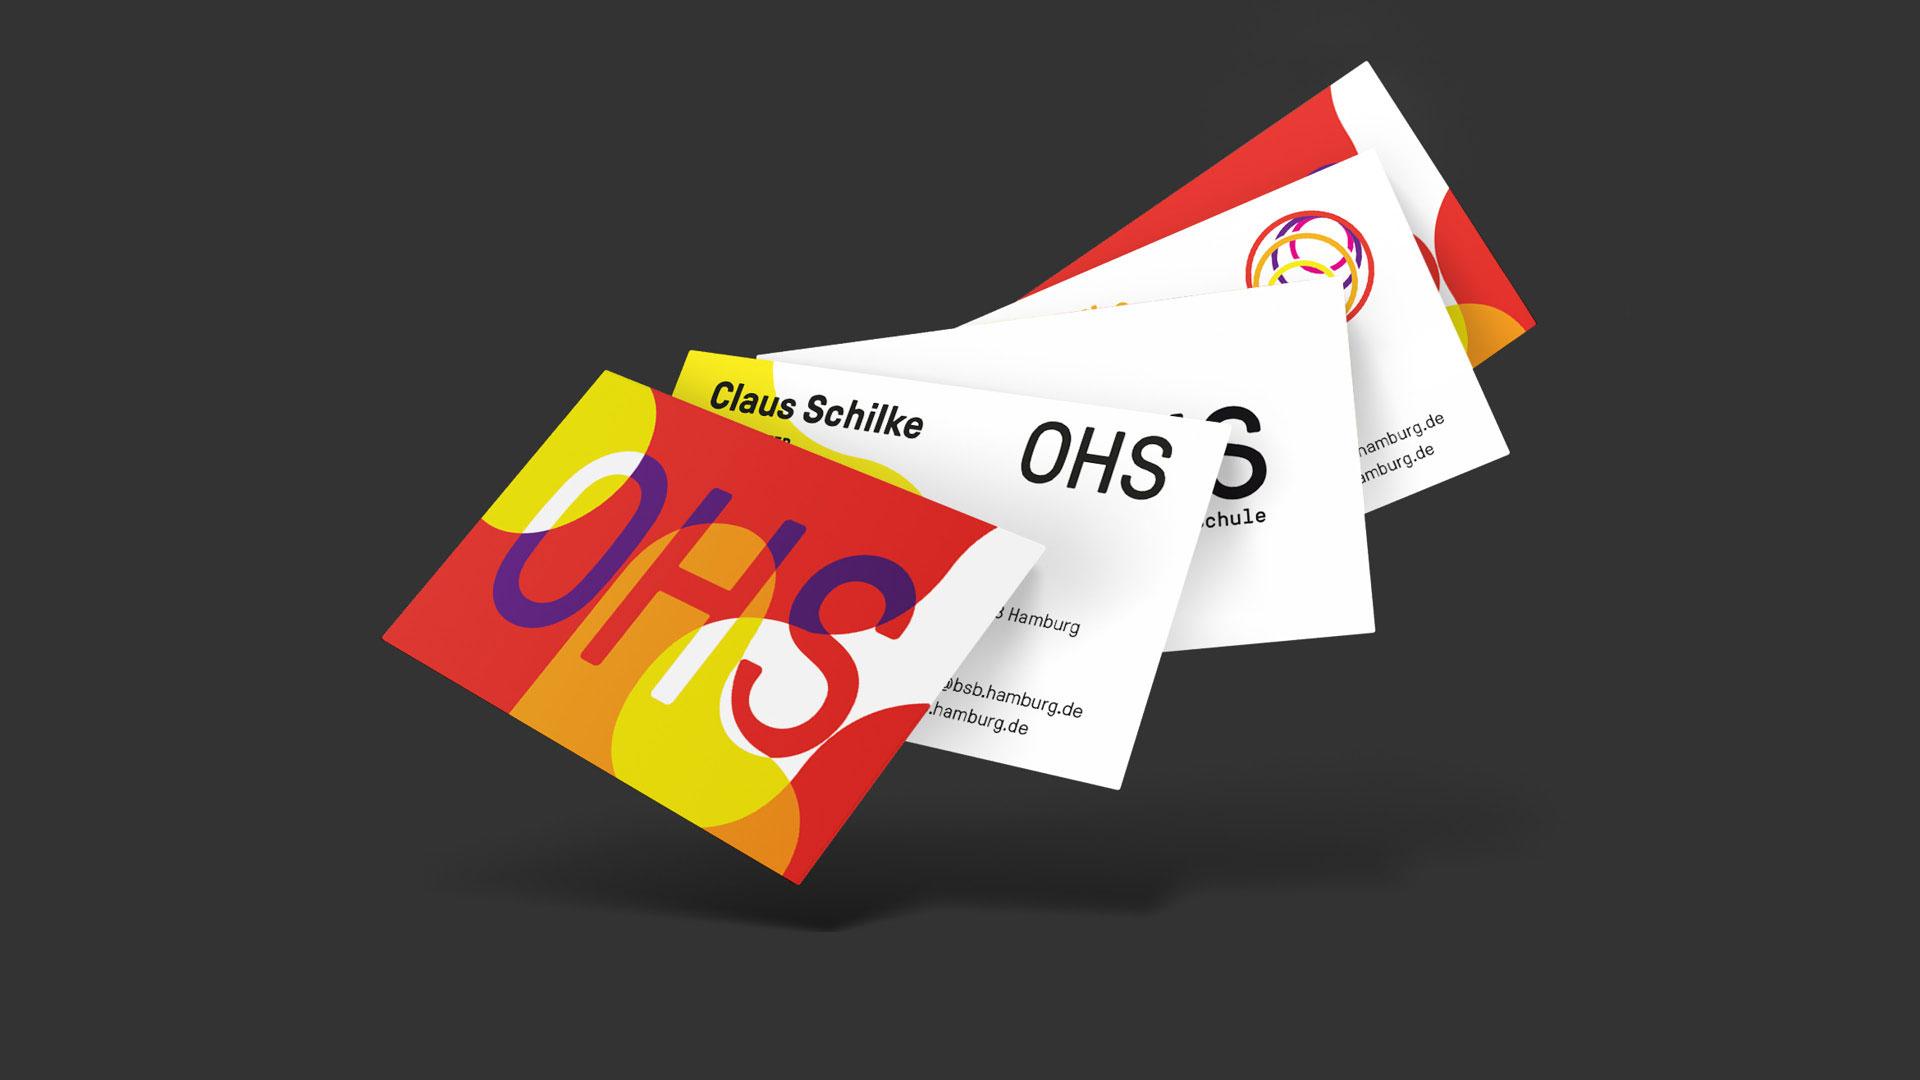 Otto-Hahn-Schule Visitenkarten Layout